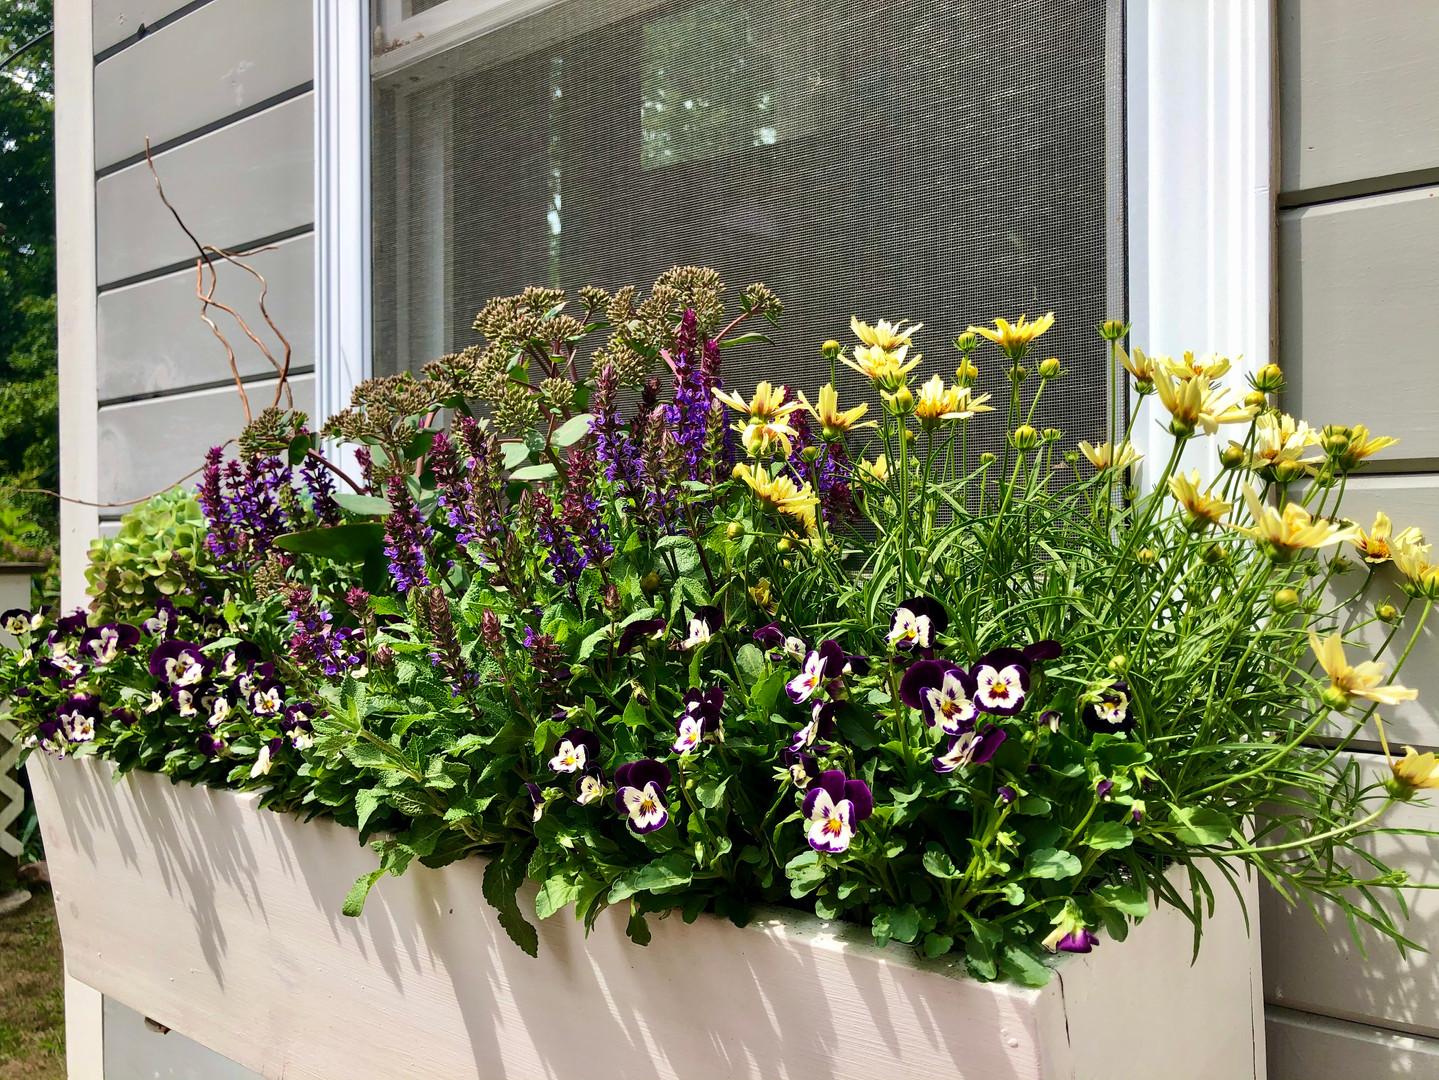 Salvia, Tickseed, and Violets